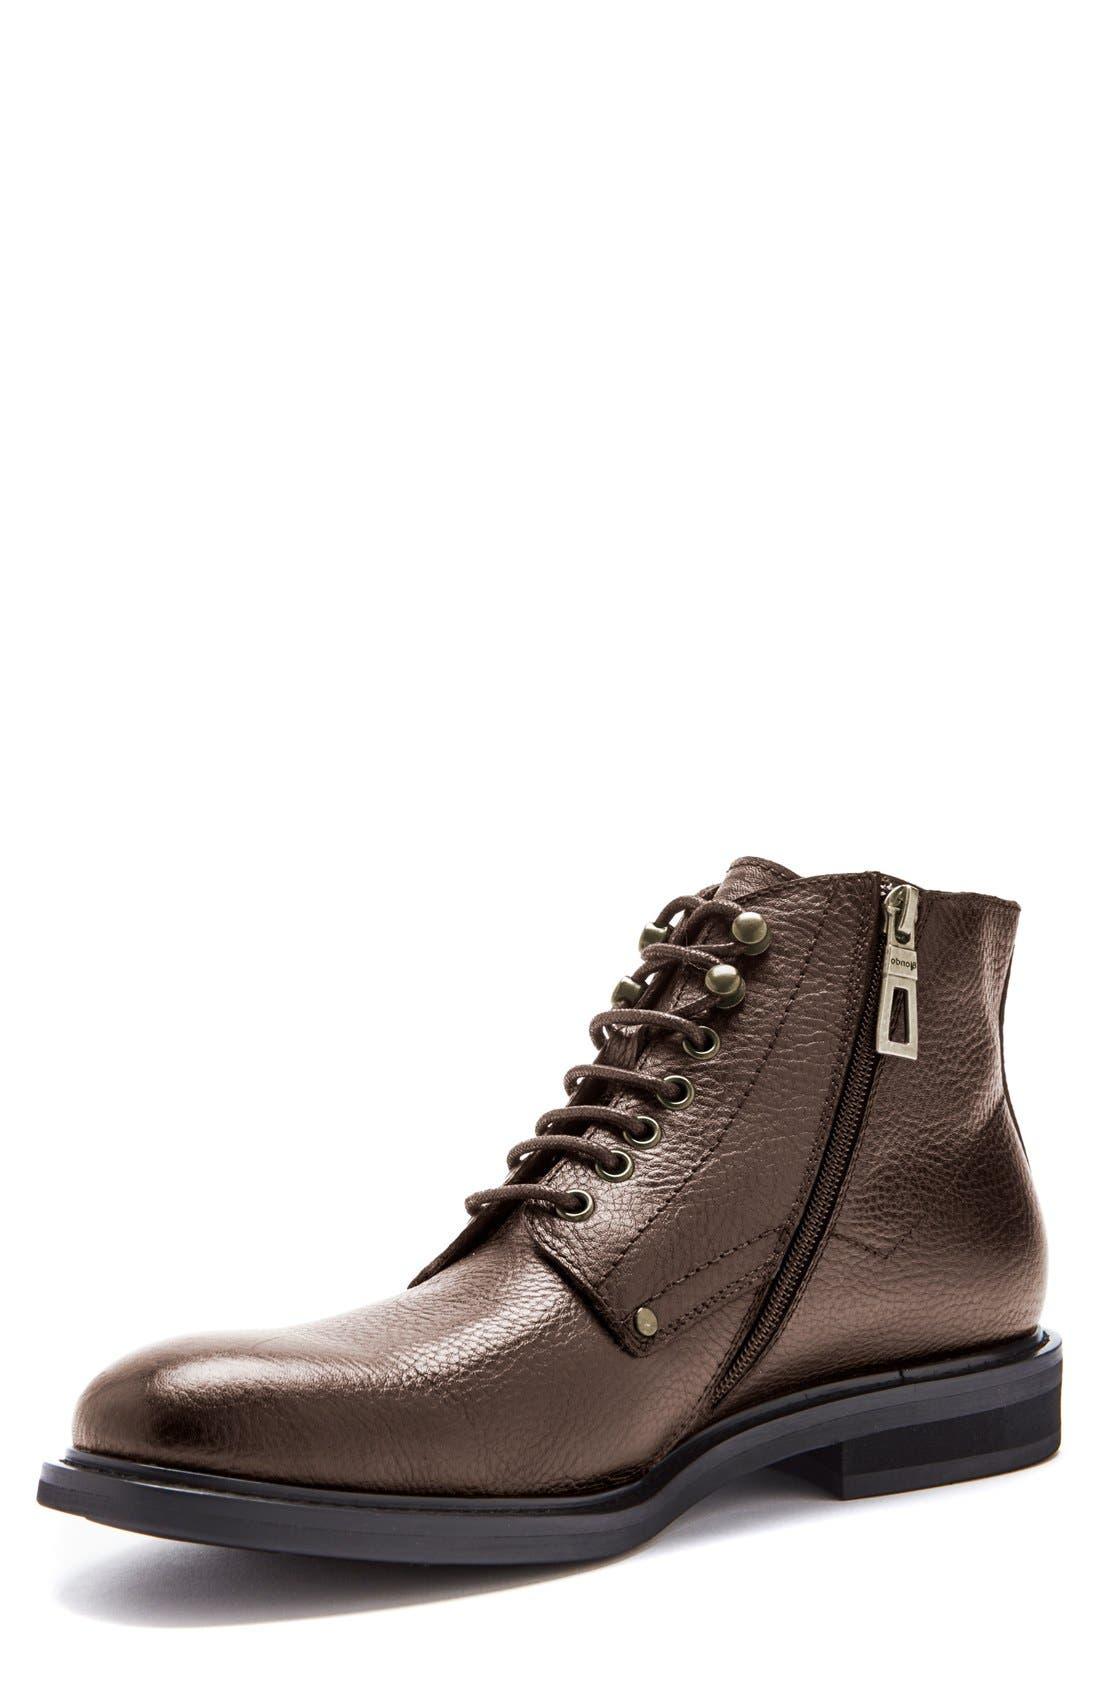 Alternate Image 1 Selected - Blondo 'Float' Waterproof Plain Toe Boot (Men)